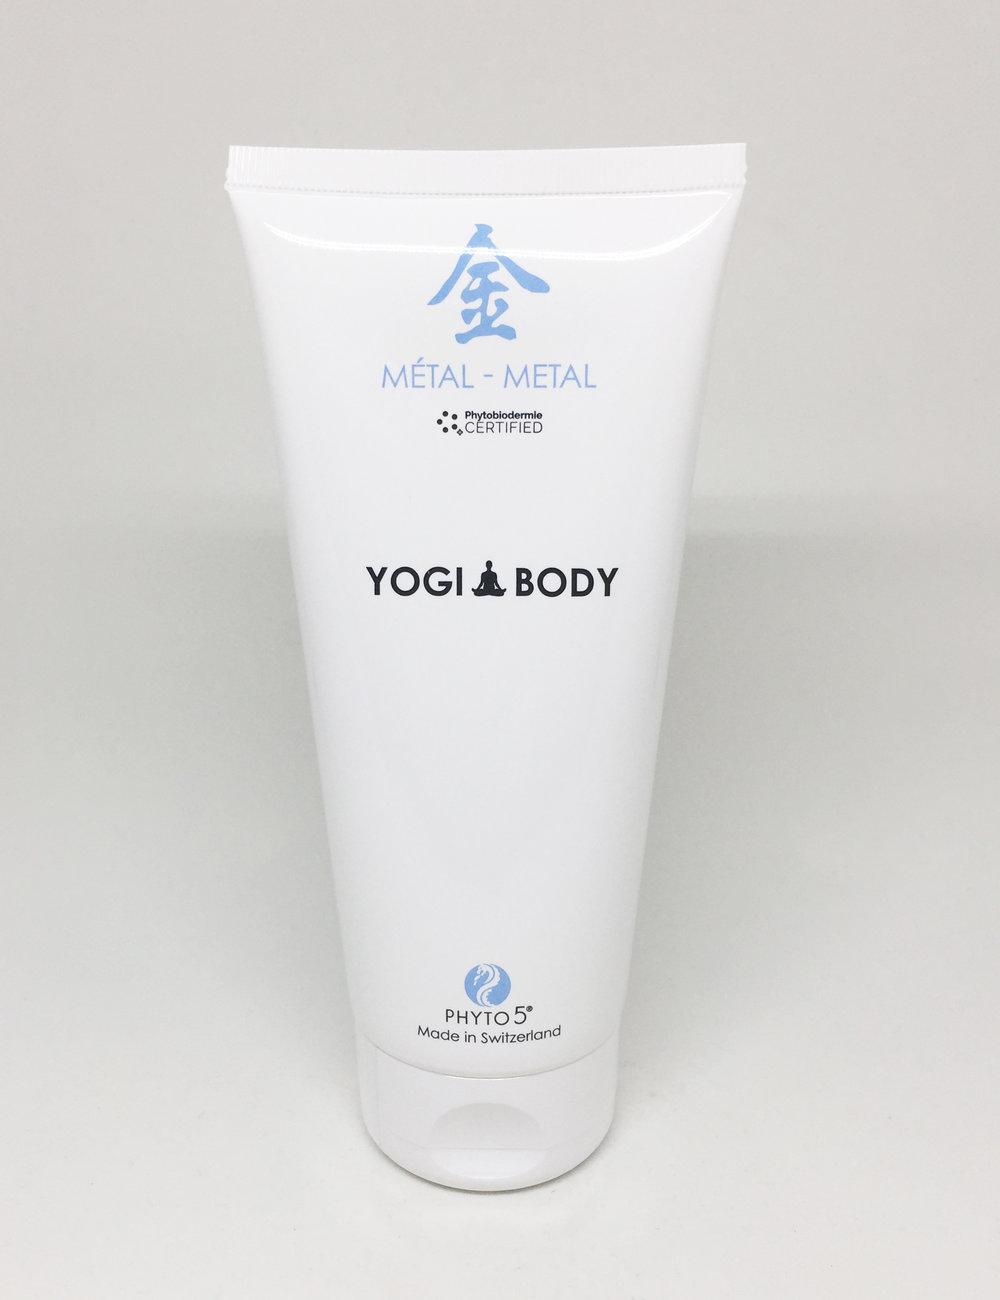 yogi_body_metal.jpg